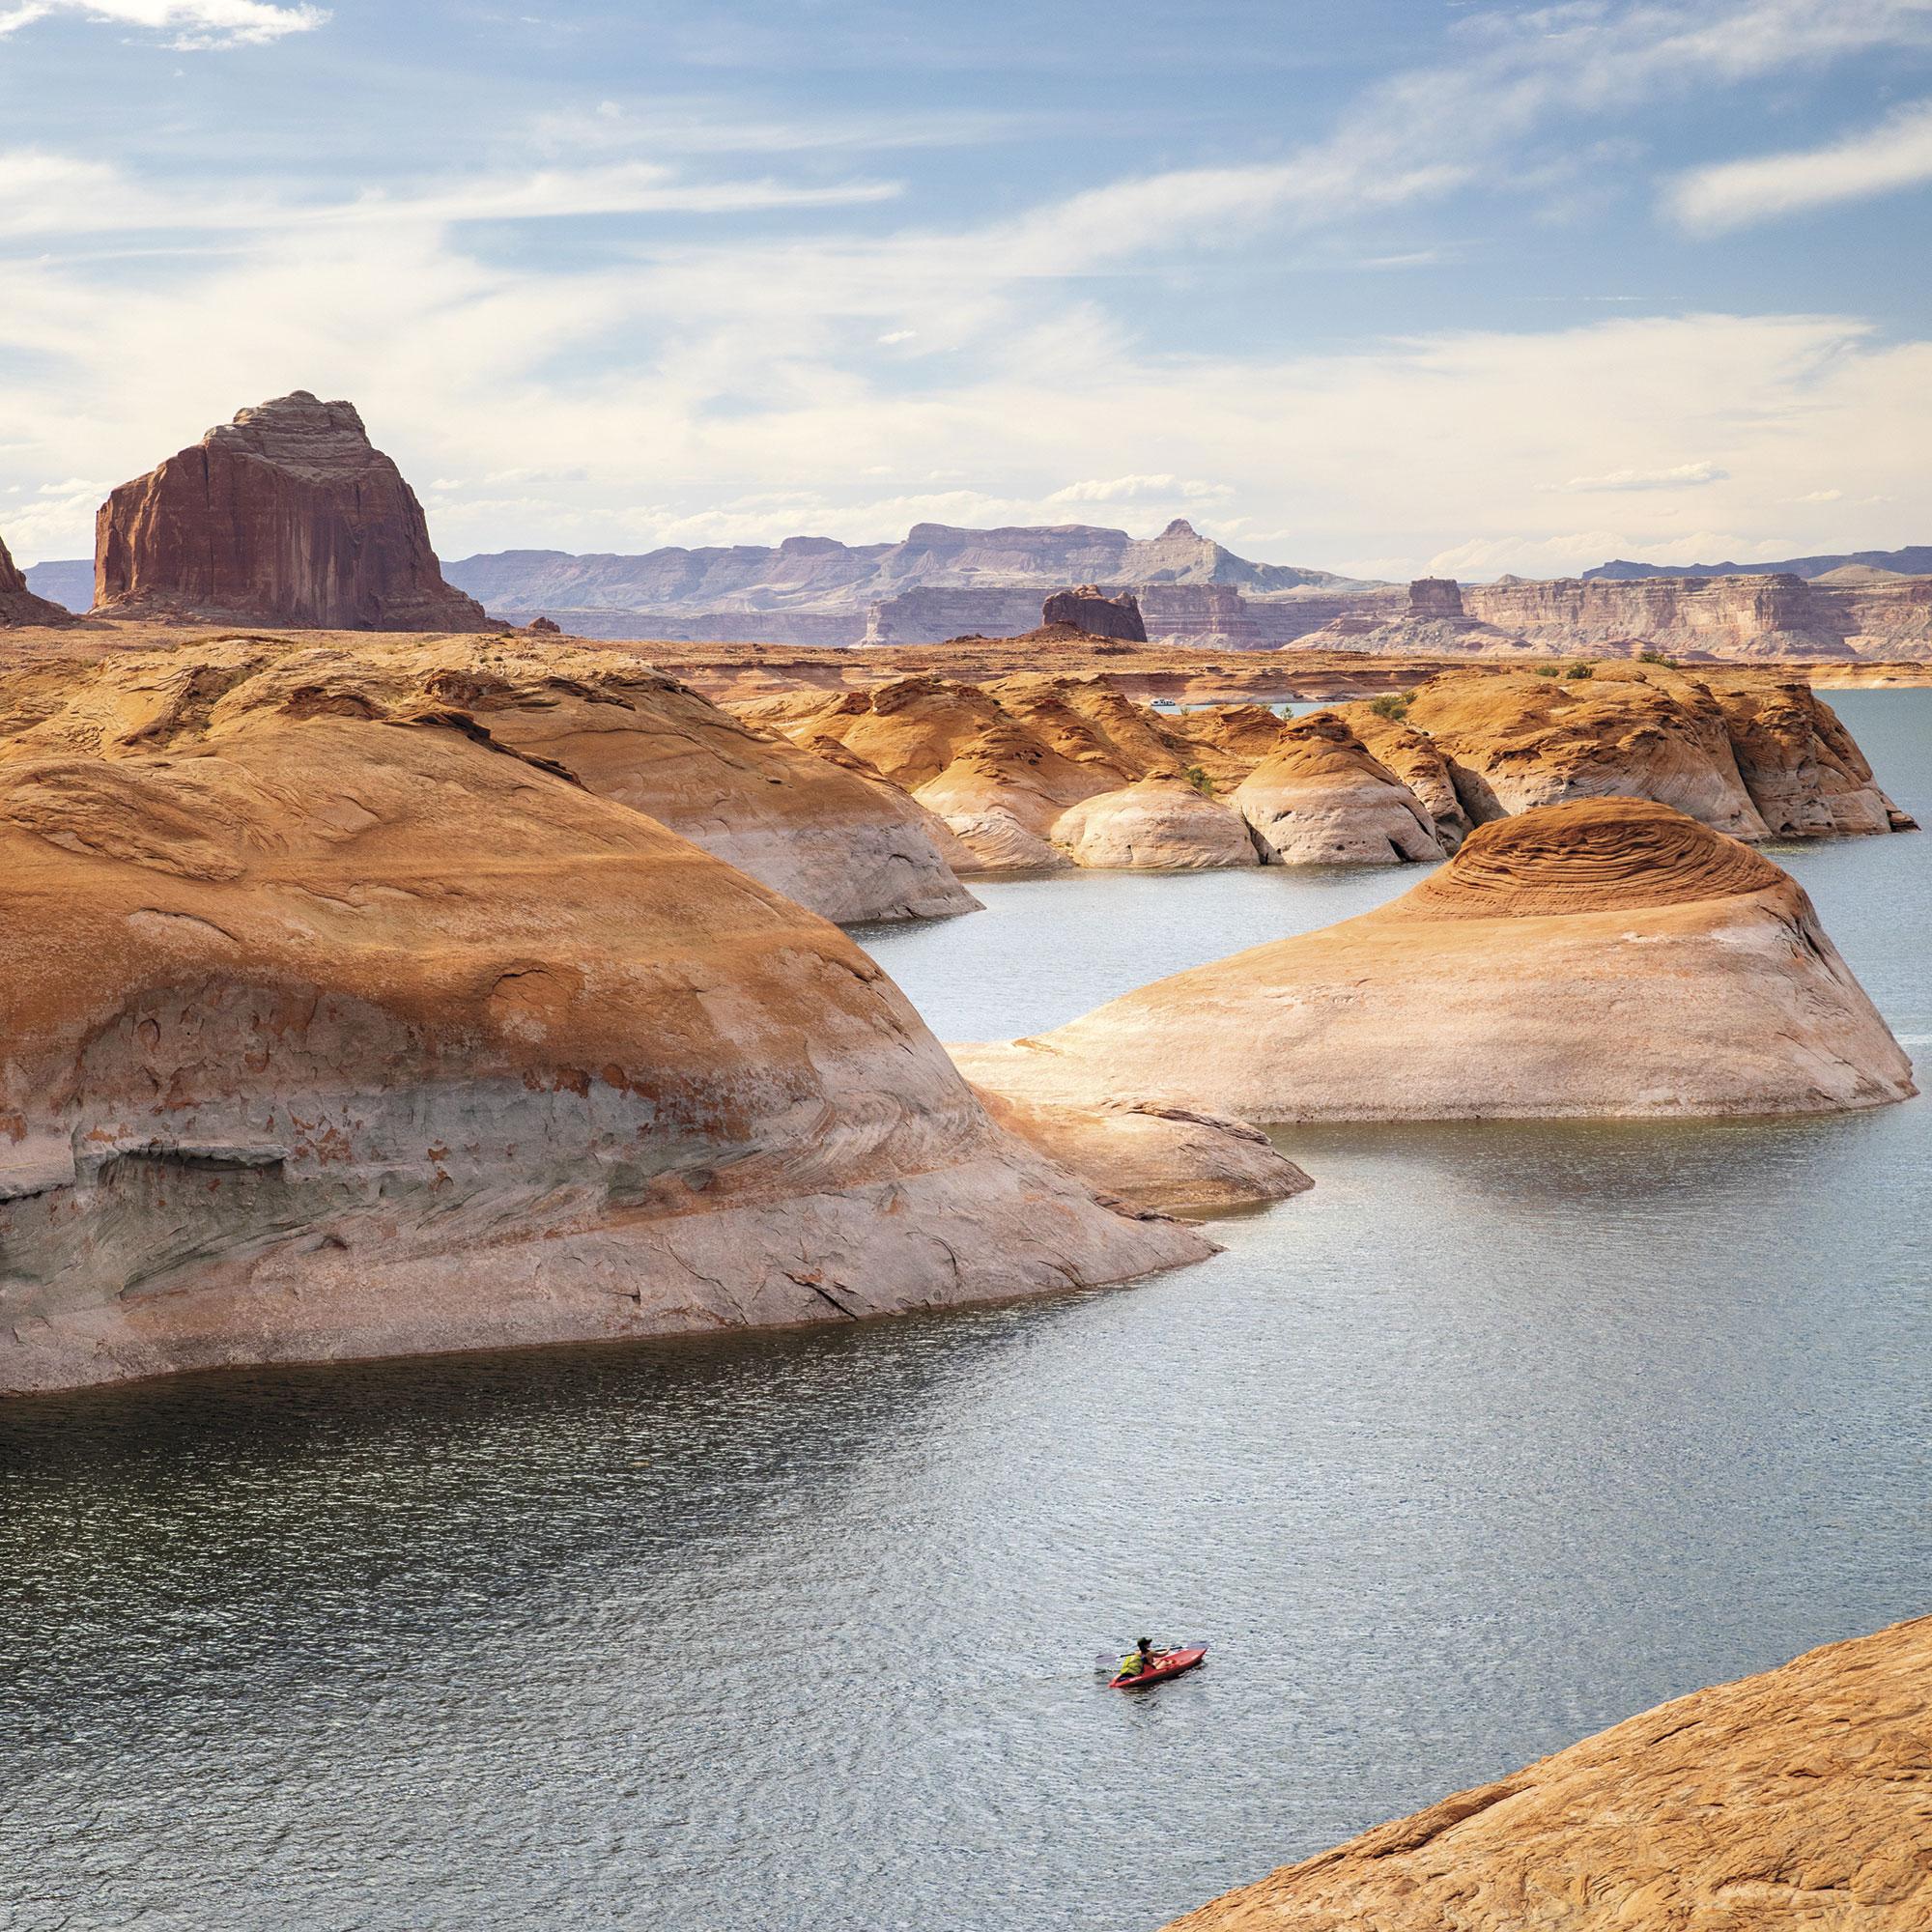 kayaking in Glen Canyon; Photo by Kevin Kaminski